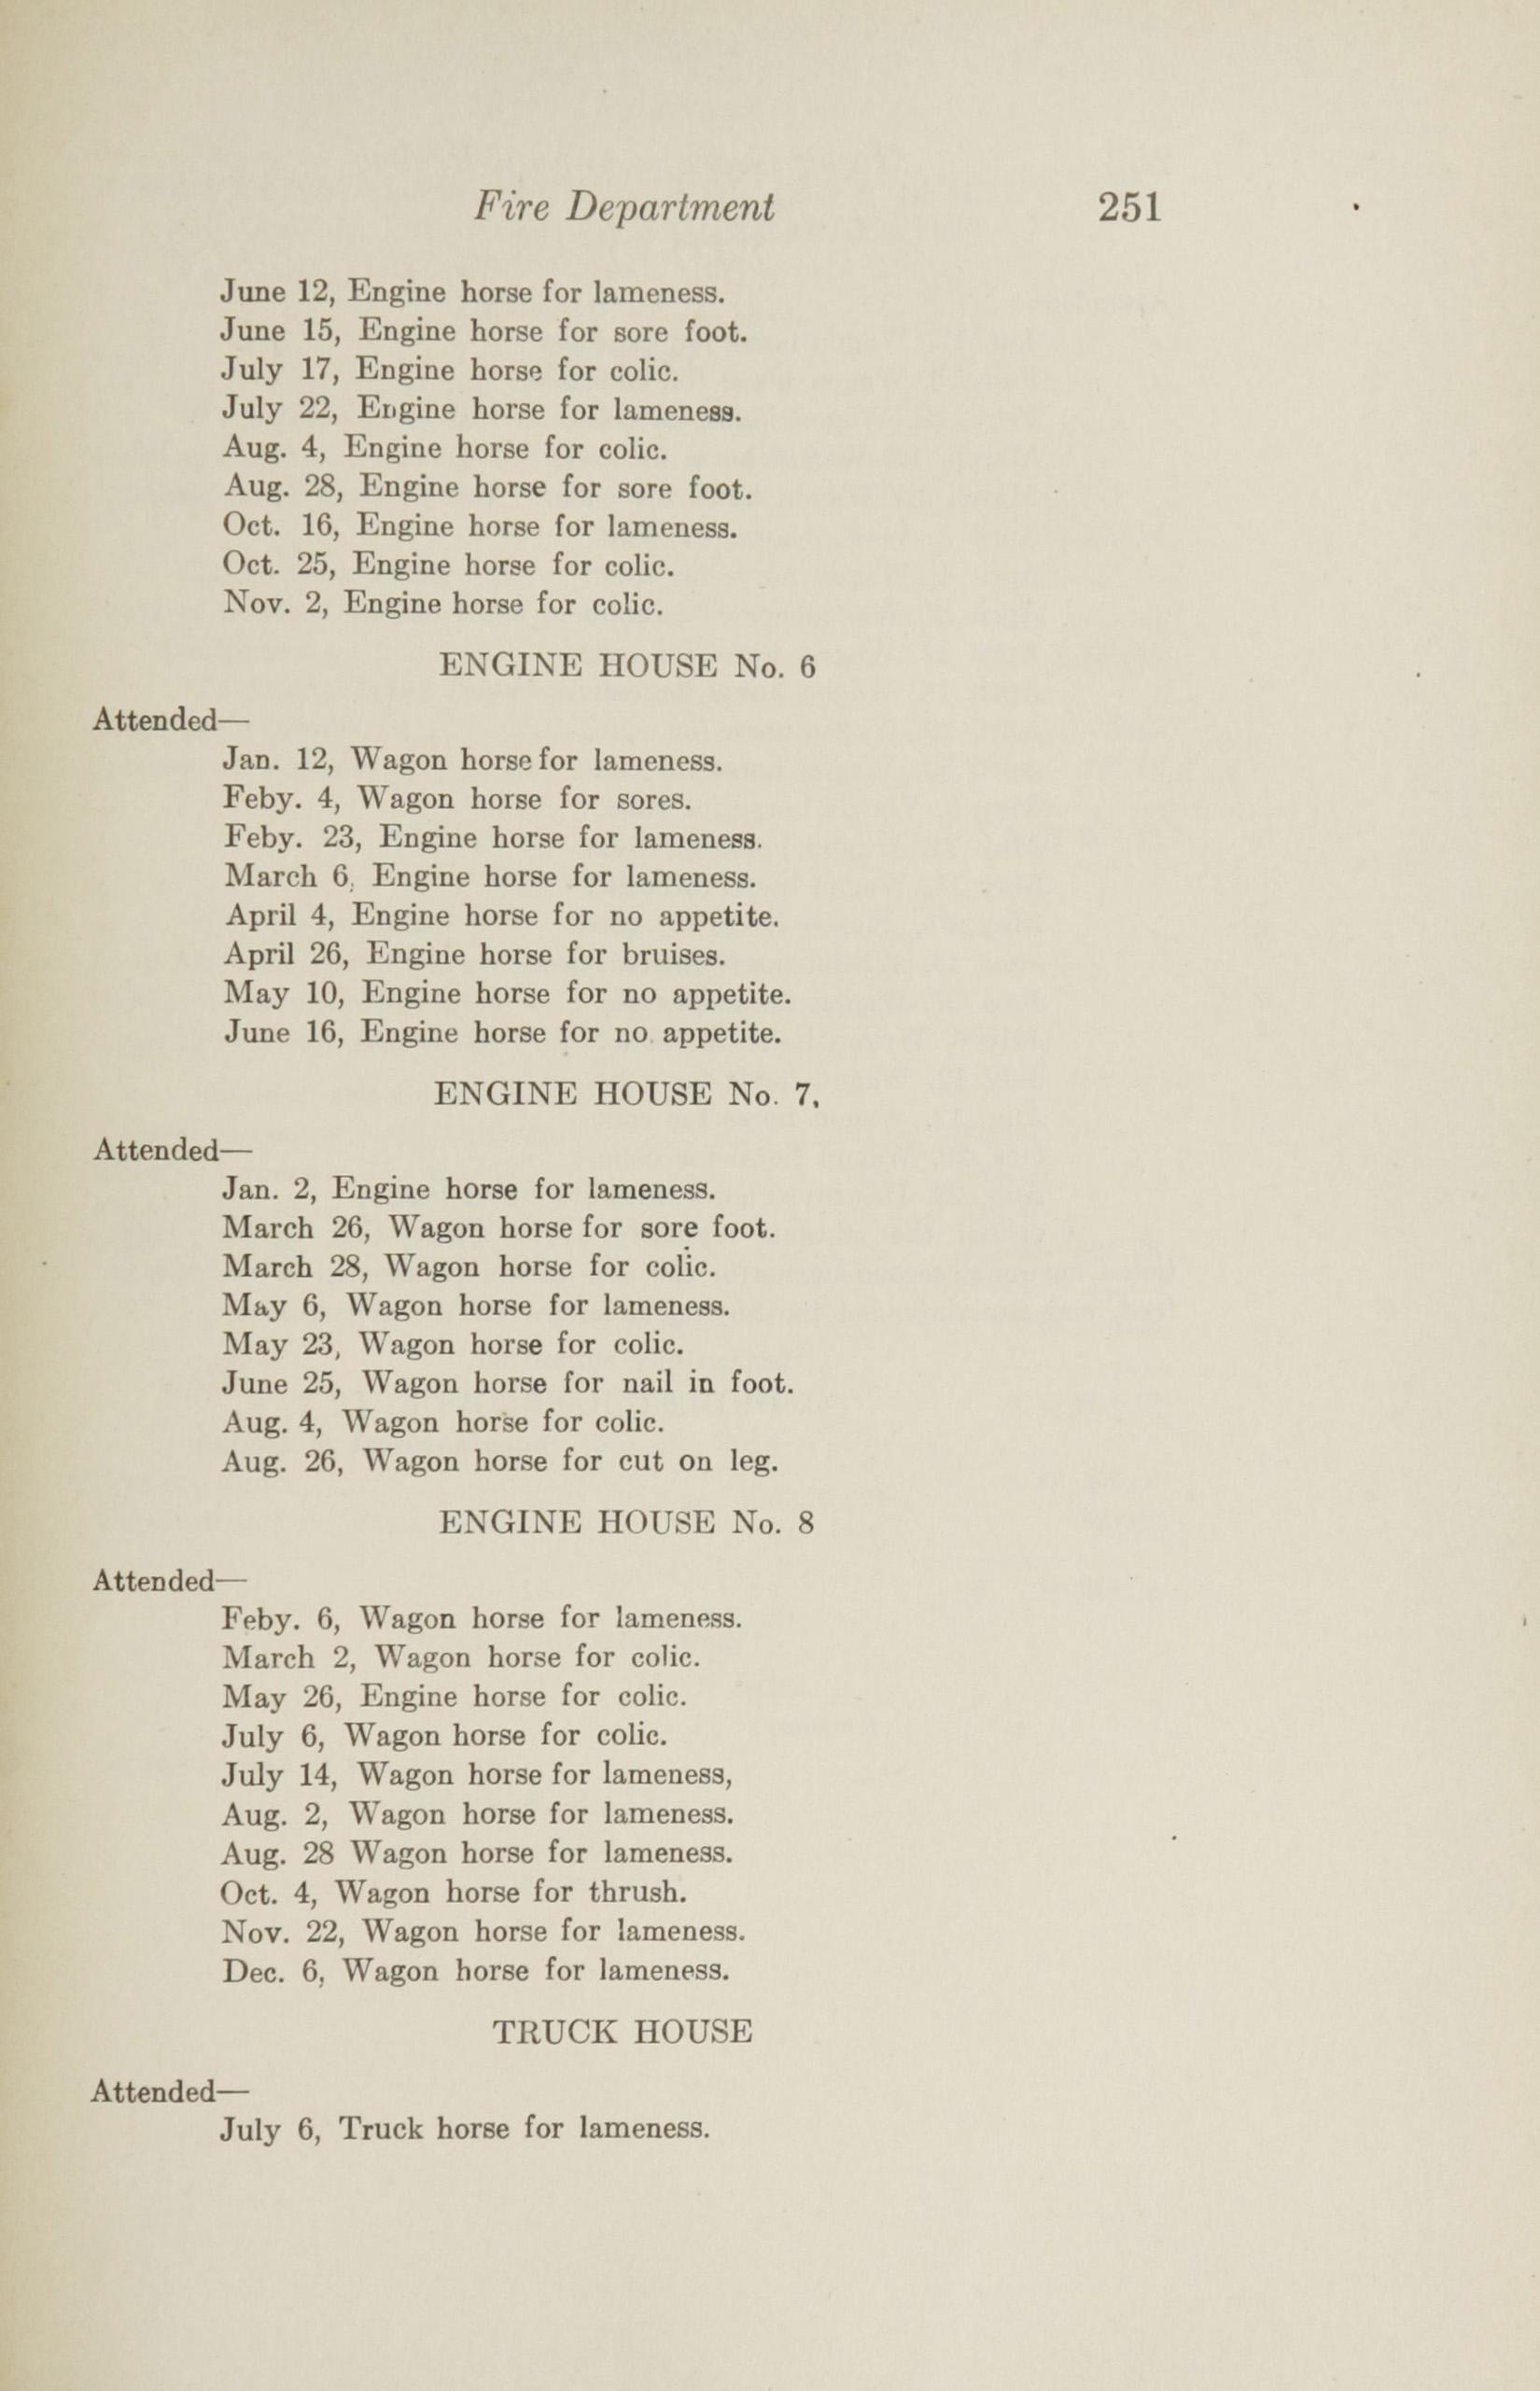 Charleston Yearbook, 1915, page 251